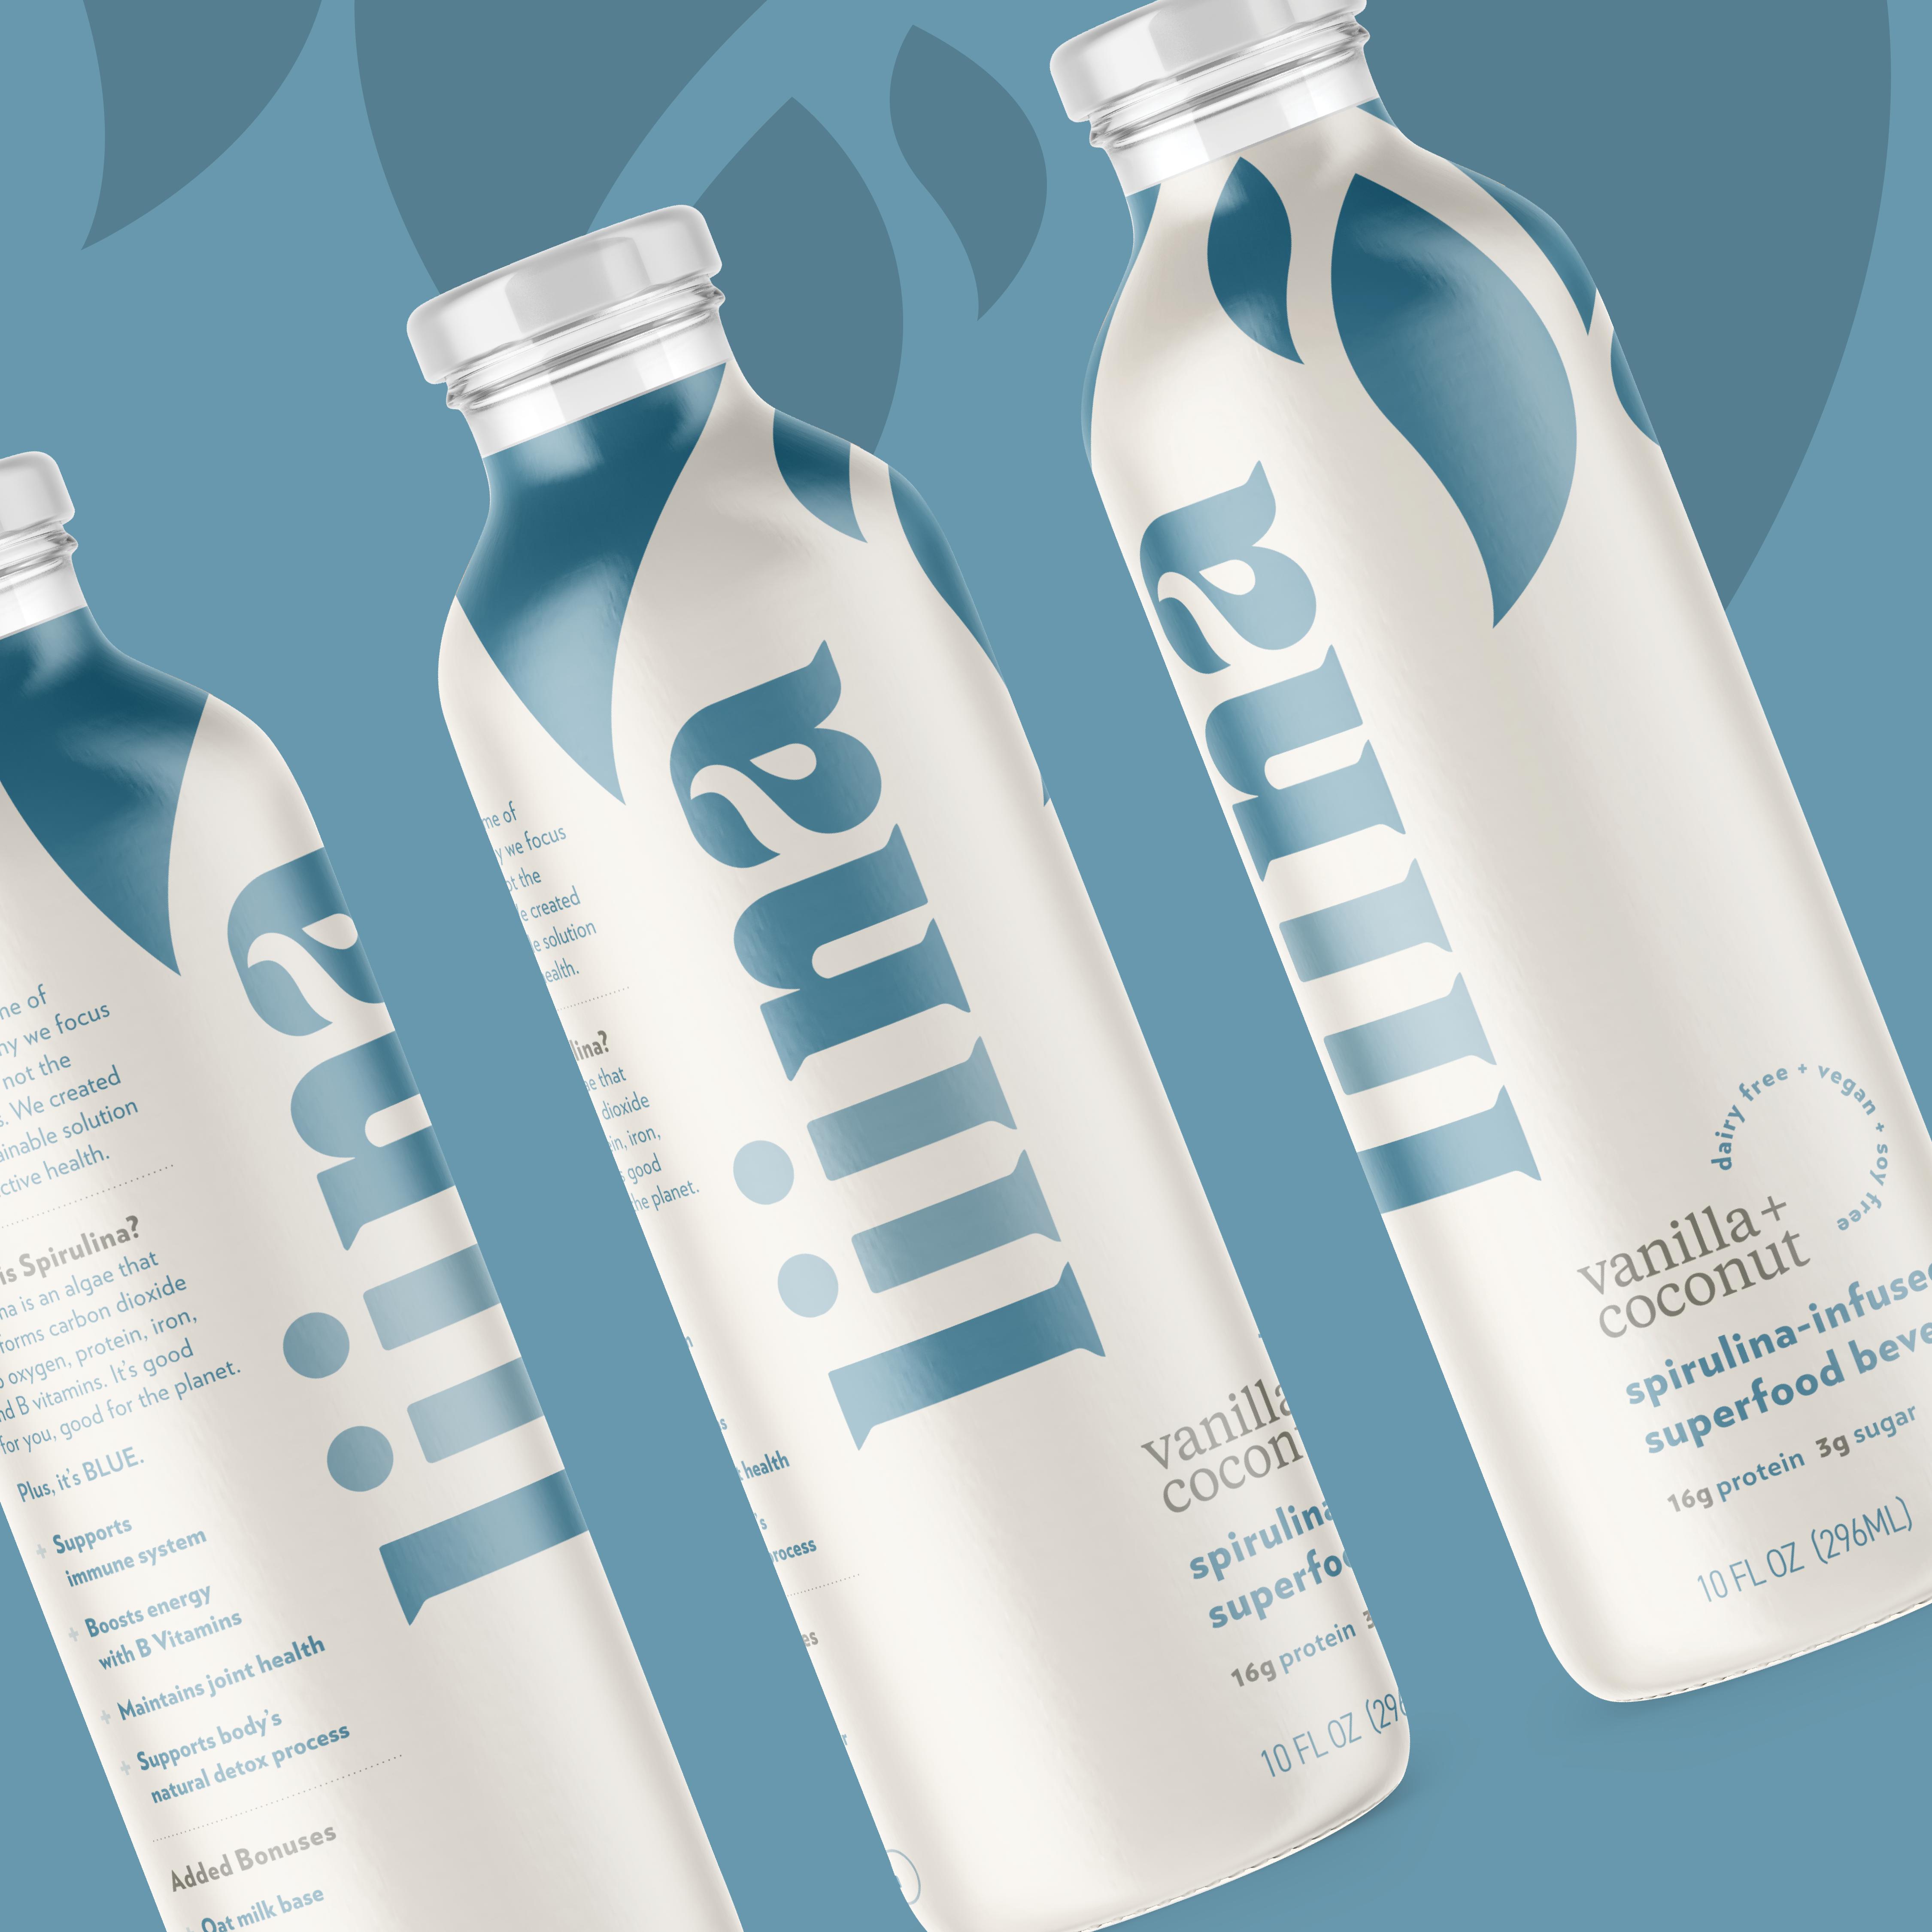 Liina Functional Beverage Branding & Package Design